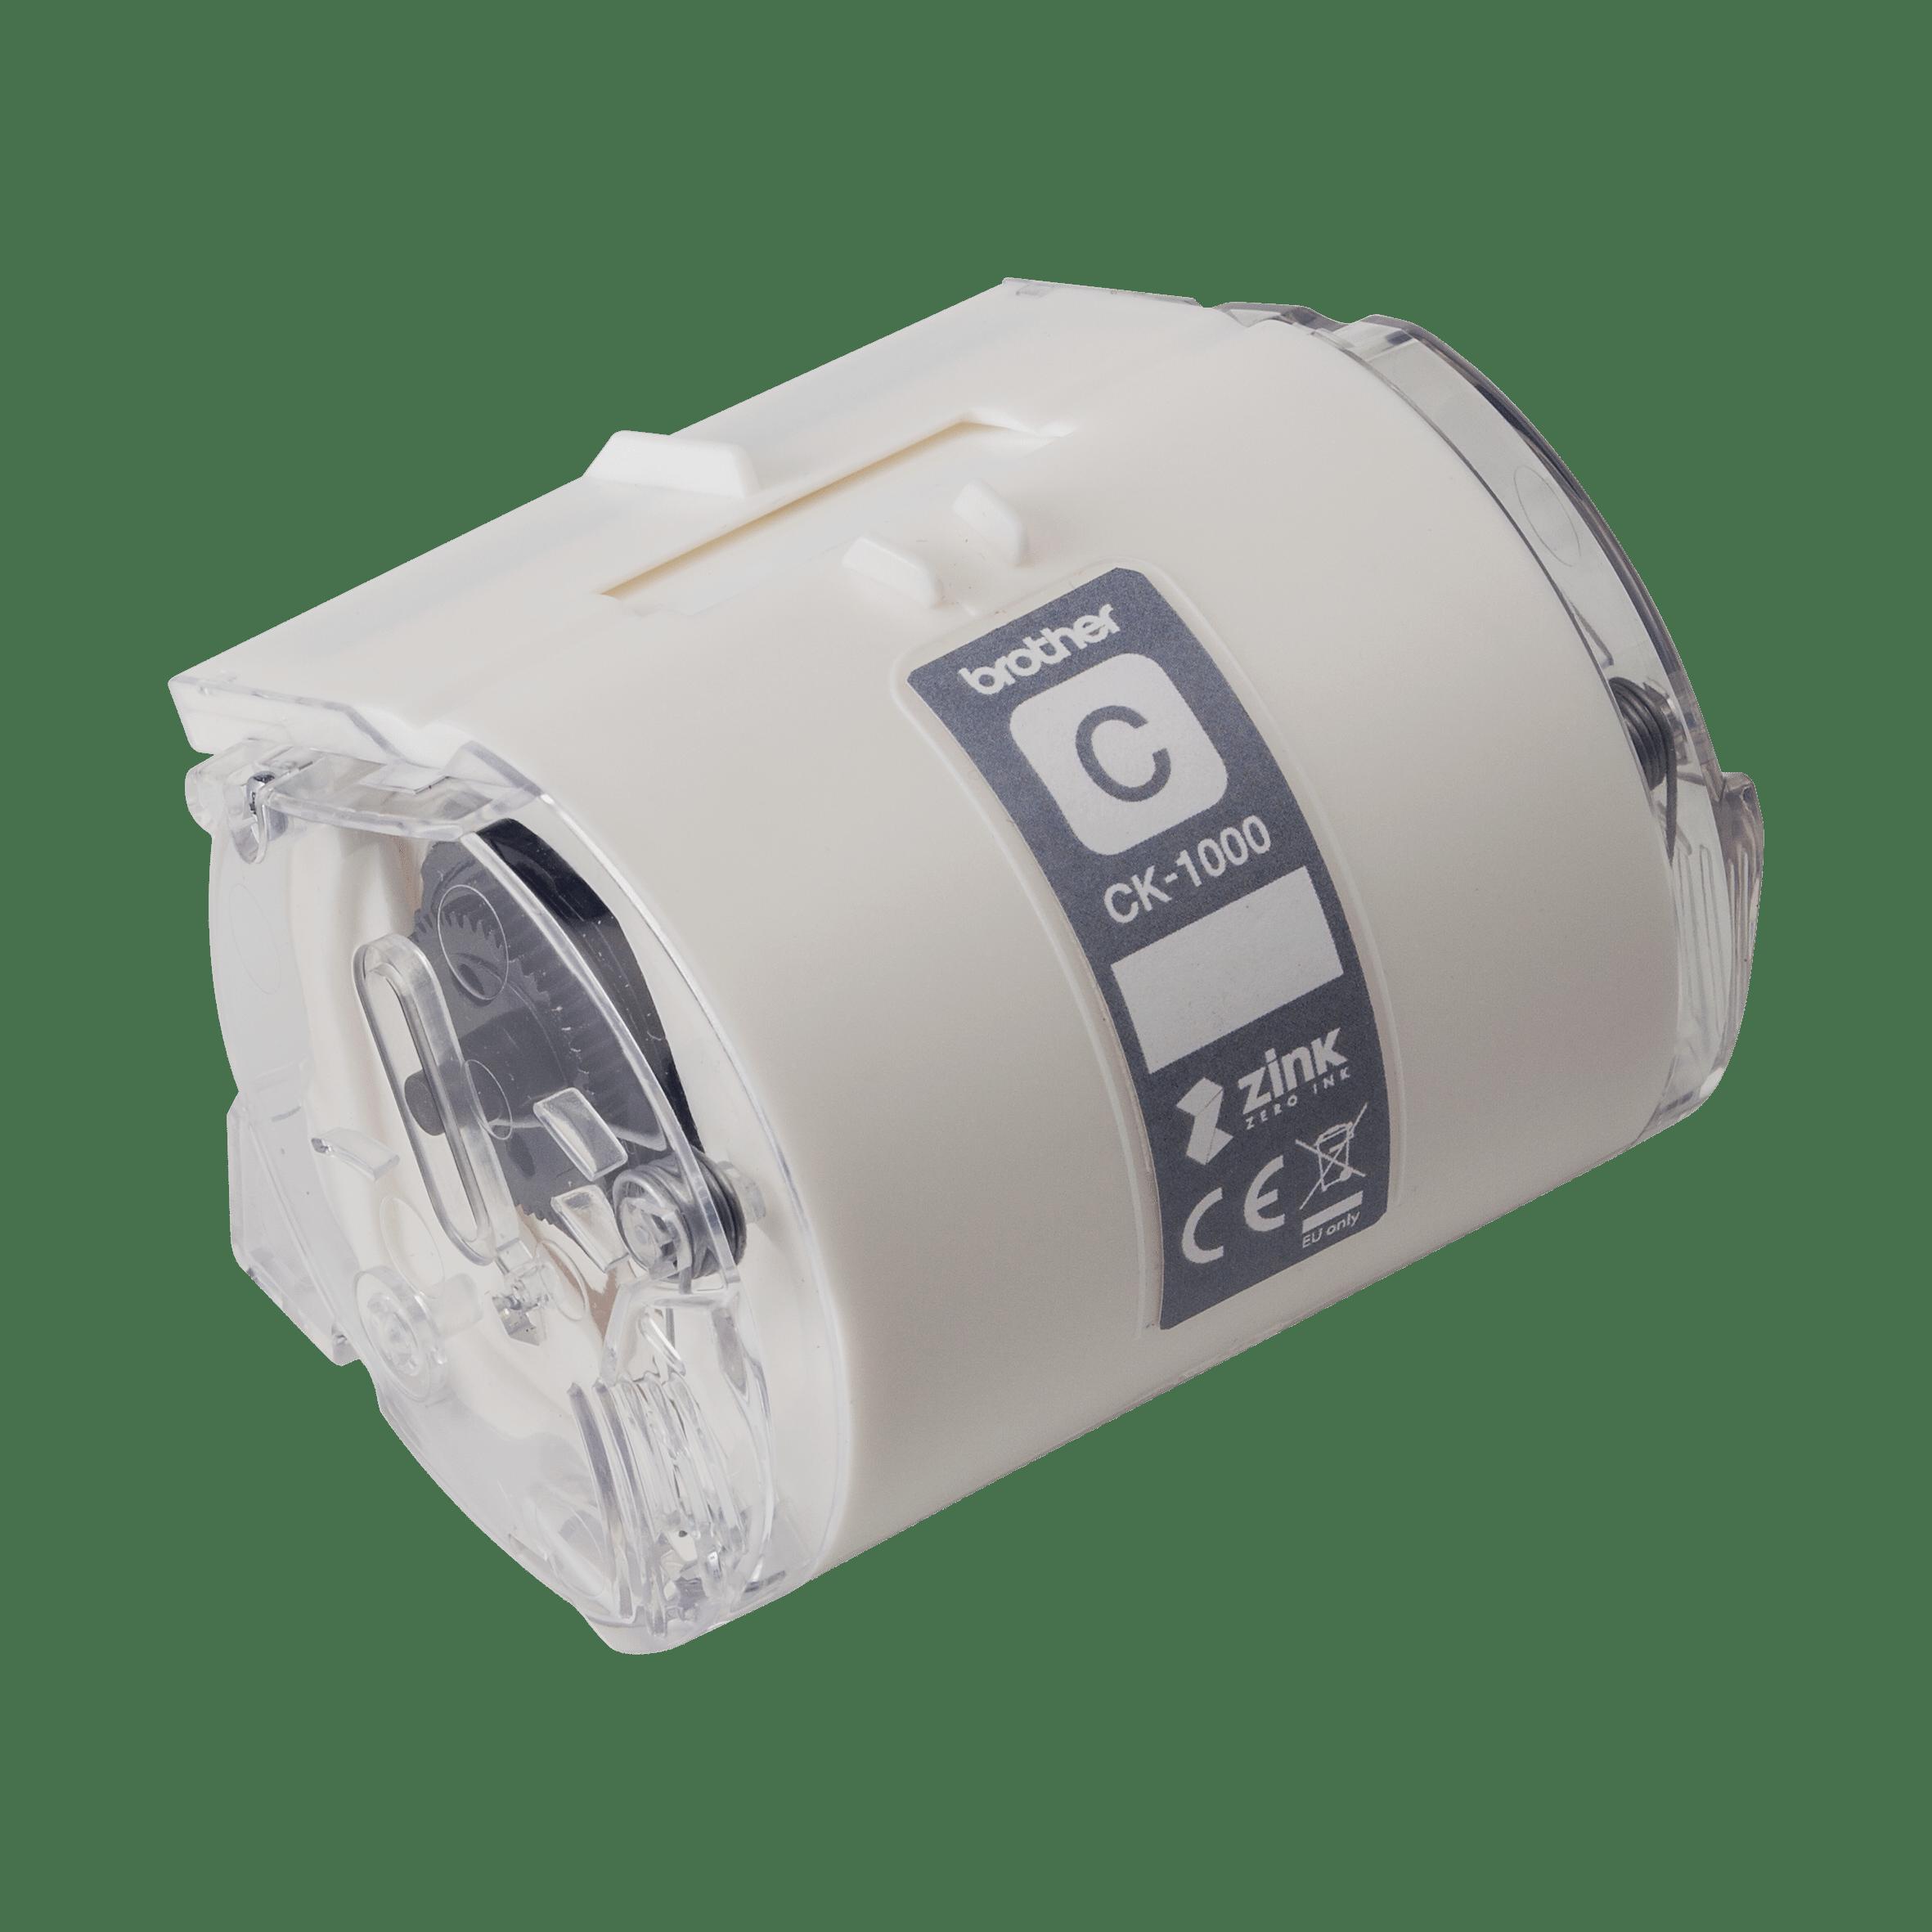 Originele Brother CK-1000 reinigingscassette, 50 mm breed